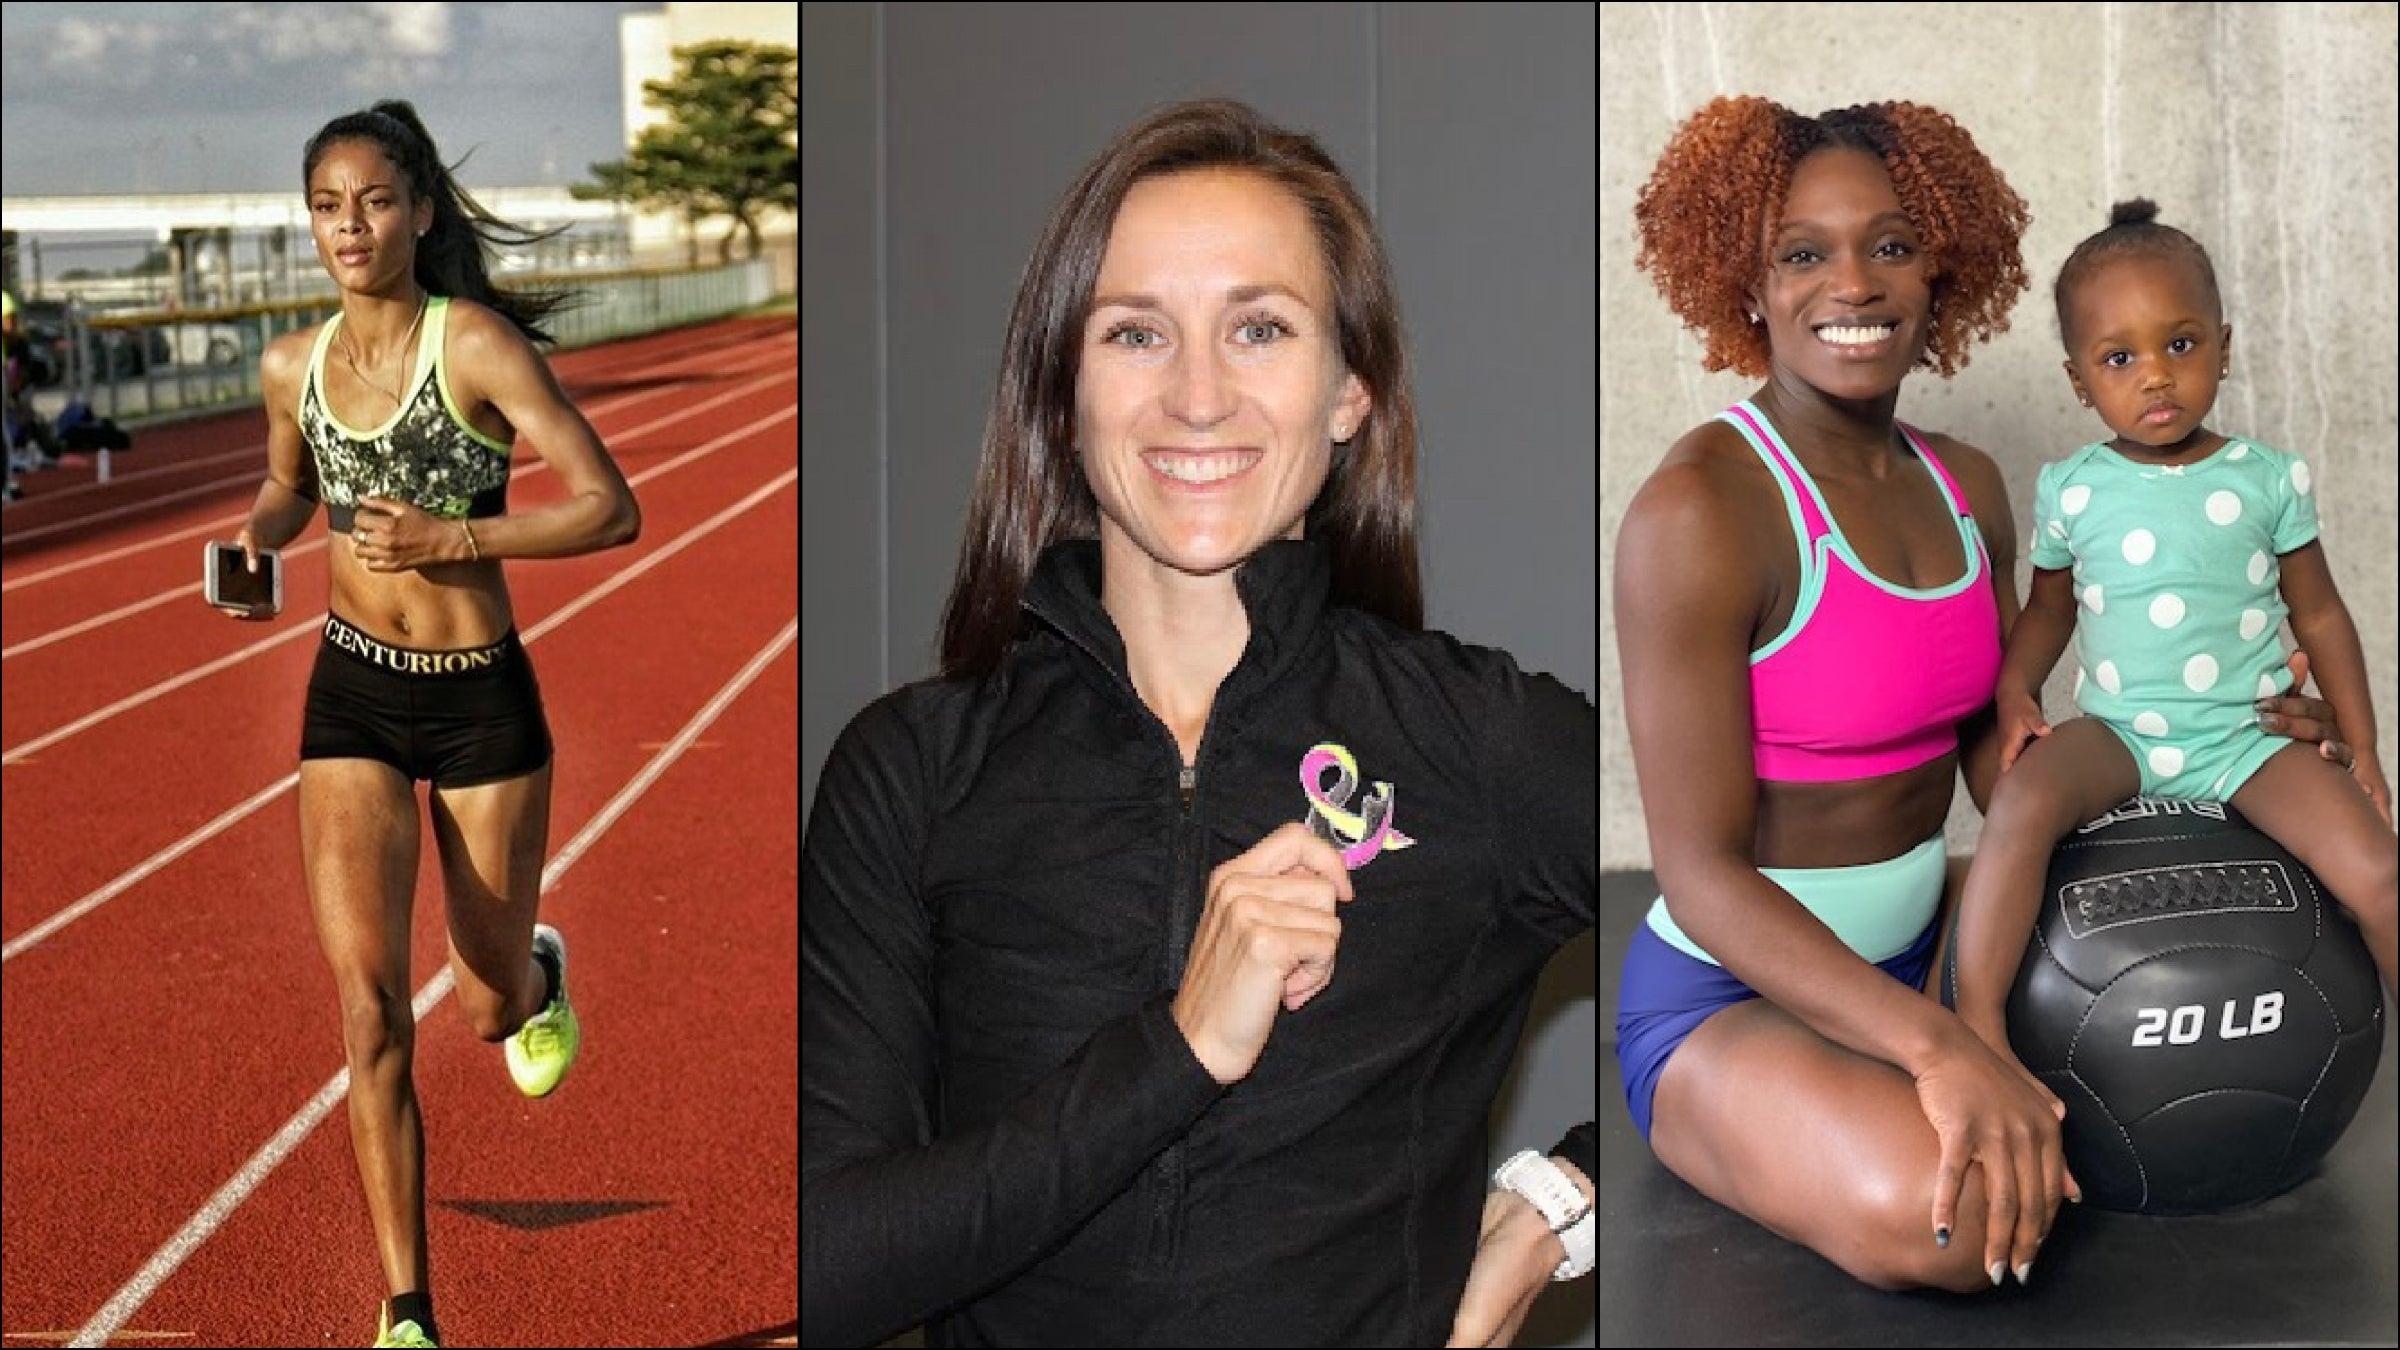 Maternity Brand Cadenshae Backs Three U.S. Olympic Hopefuls